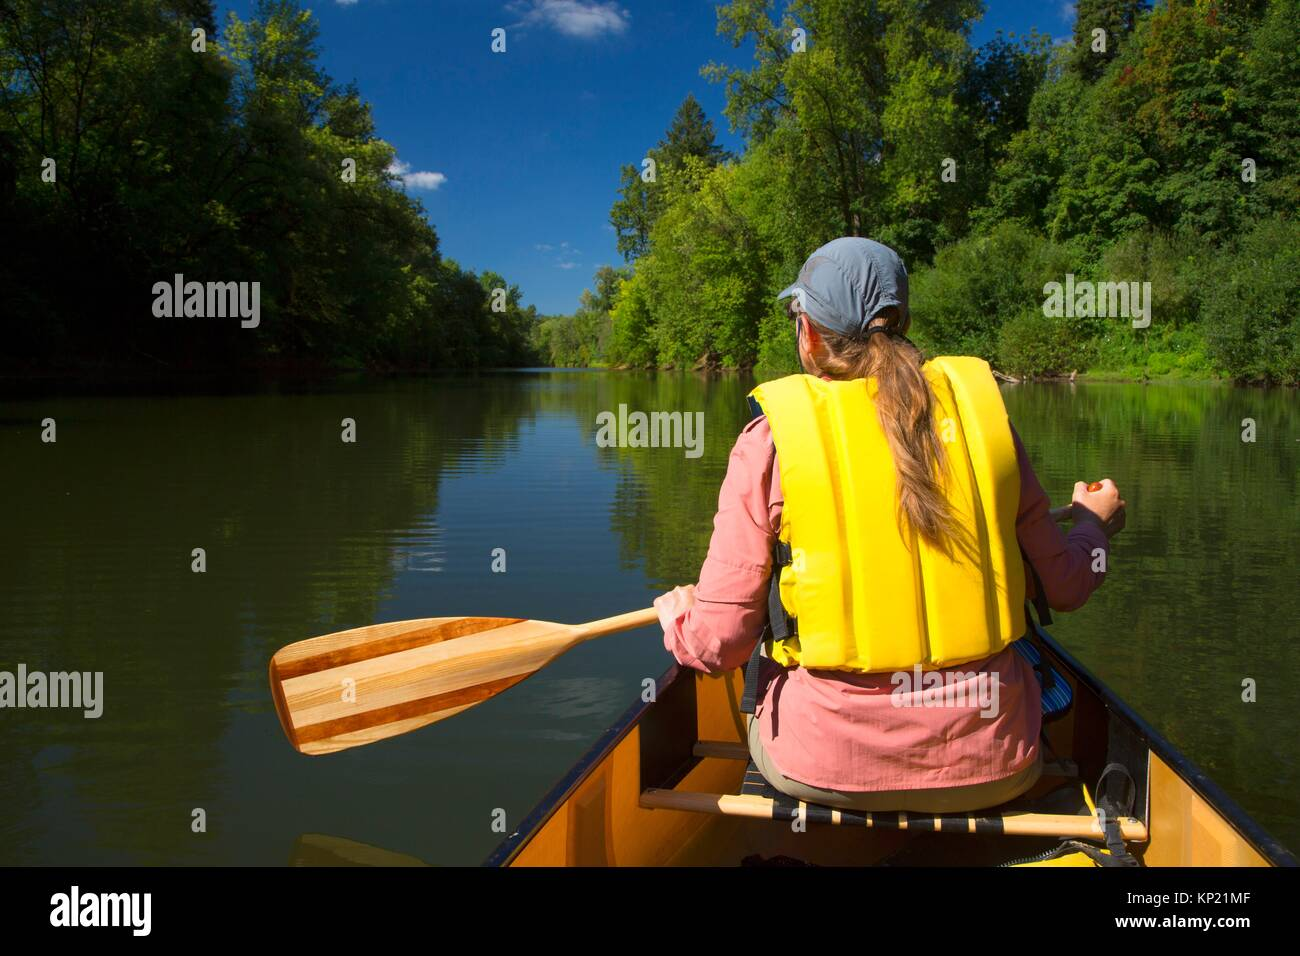 Canoeing the Yamhill River, Dayton Landing County Park, Yamhill County, Oregon. - Stock Image